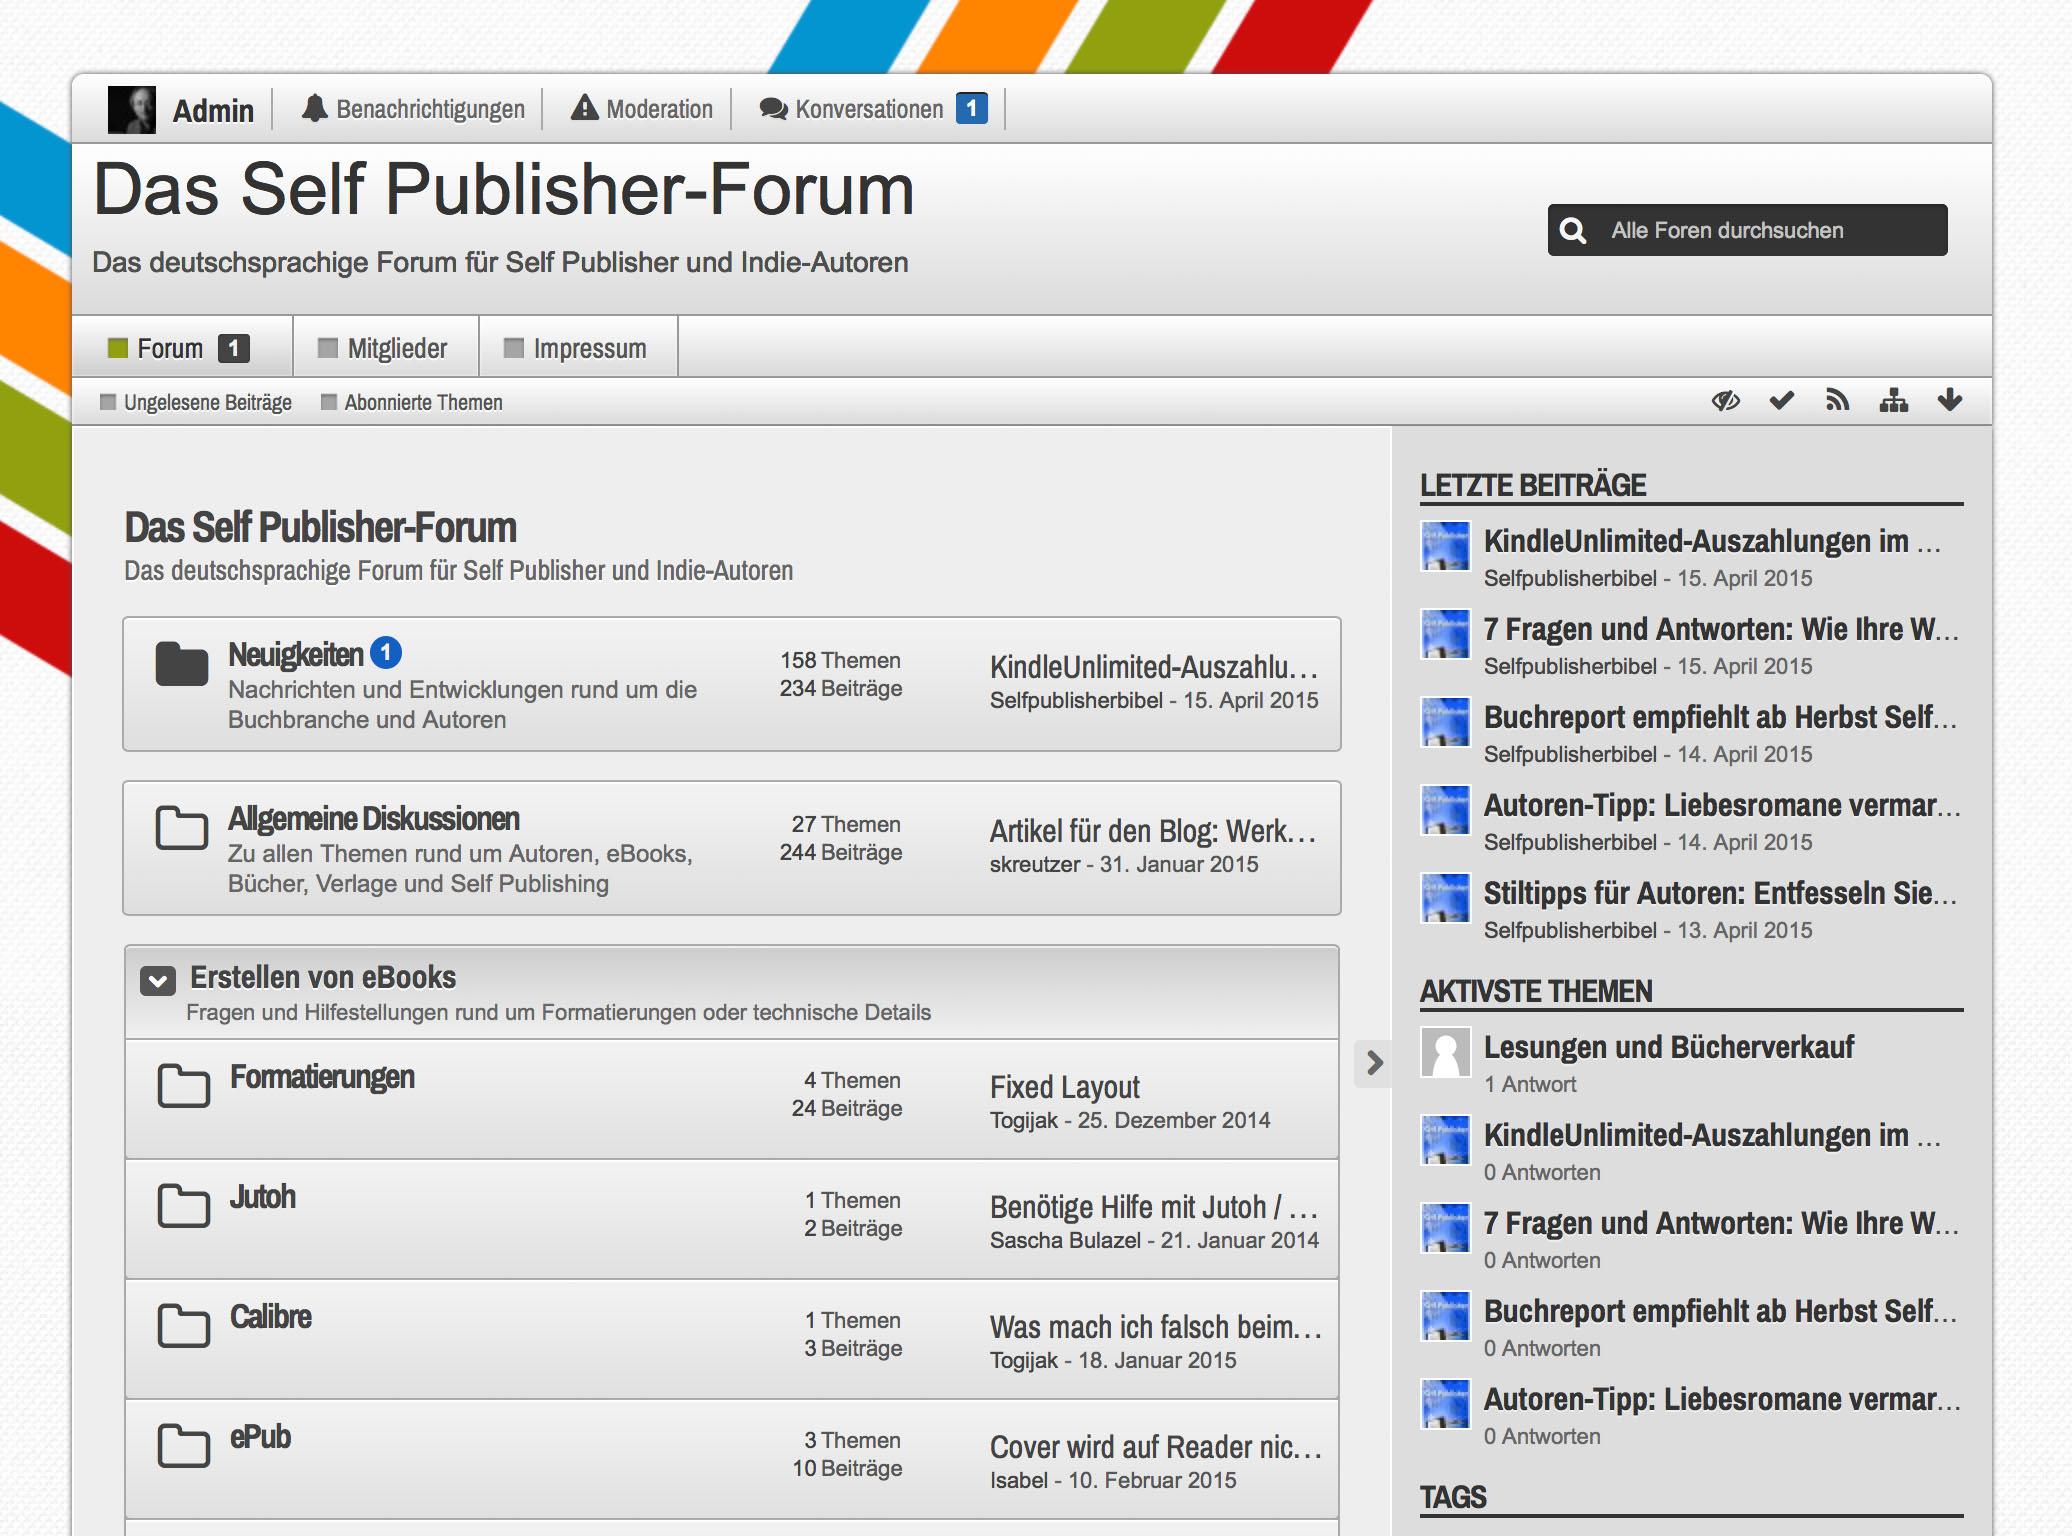 Selfpublisher-Forum.de